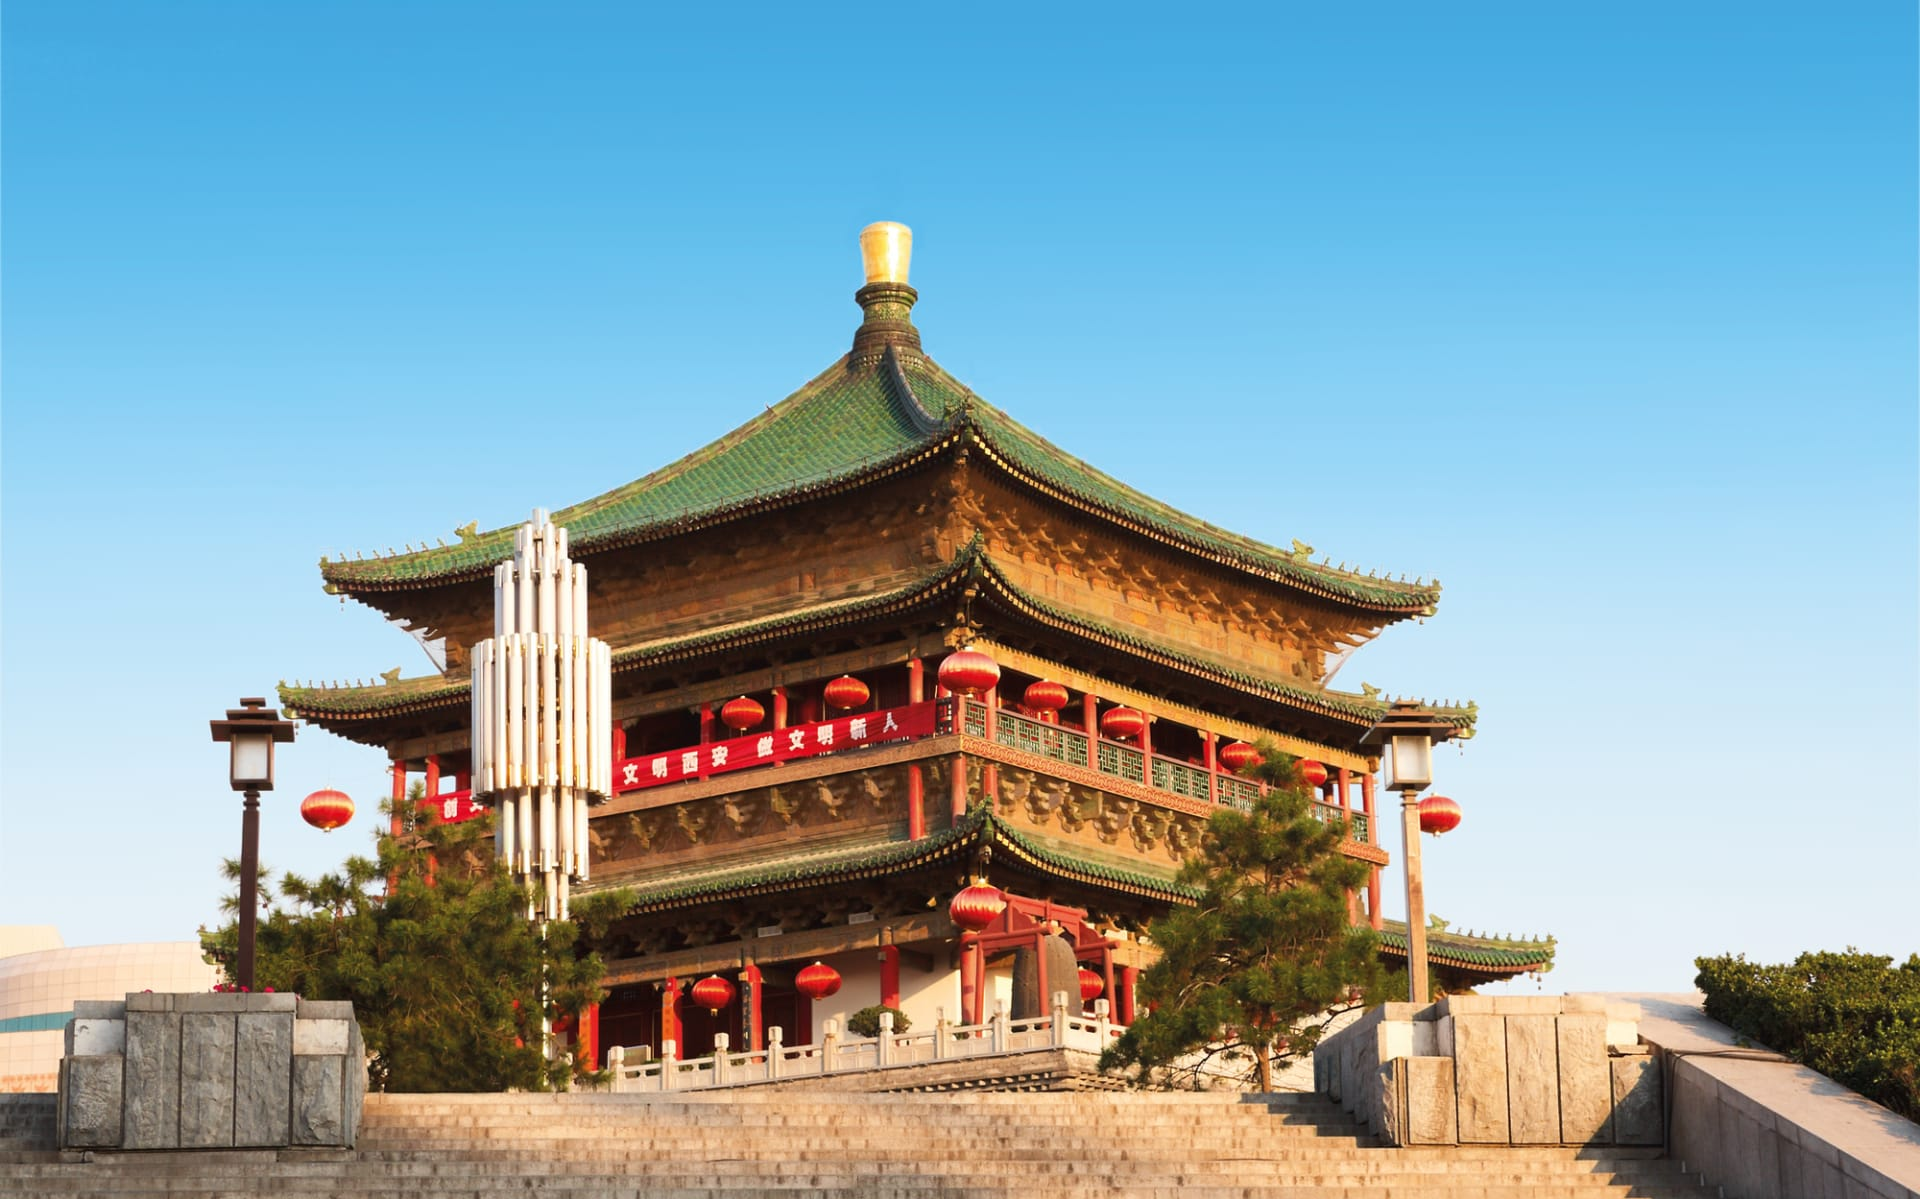 Privat Zeitreise durch China/D ab Peking: Chian_Xian_Glockenturm_shutterstock_28551752_NataliyaHora